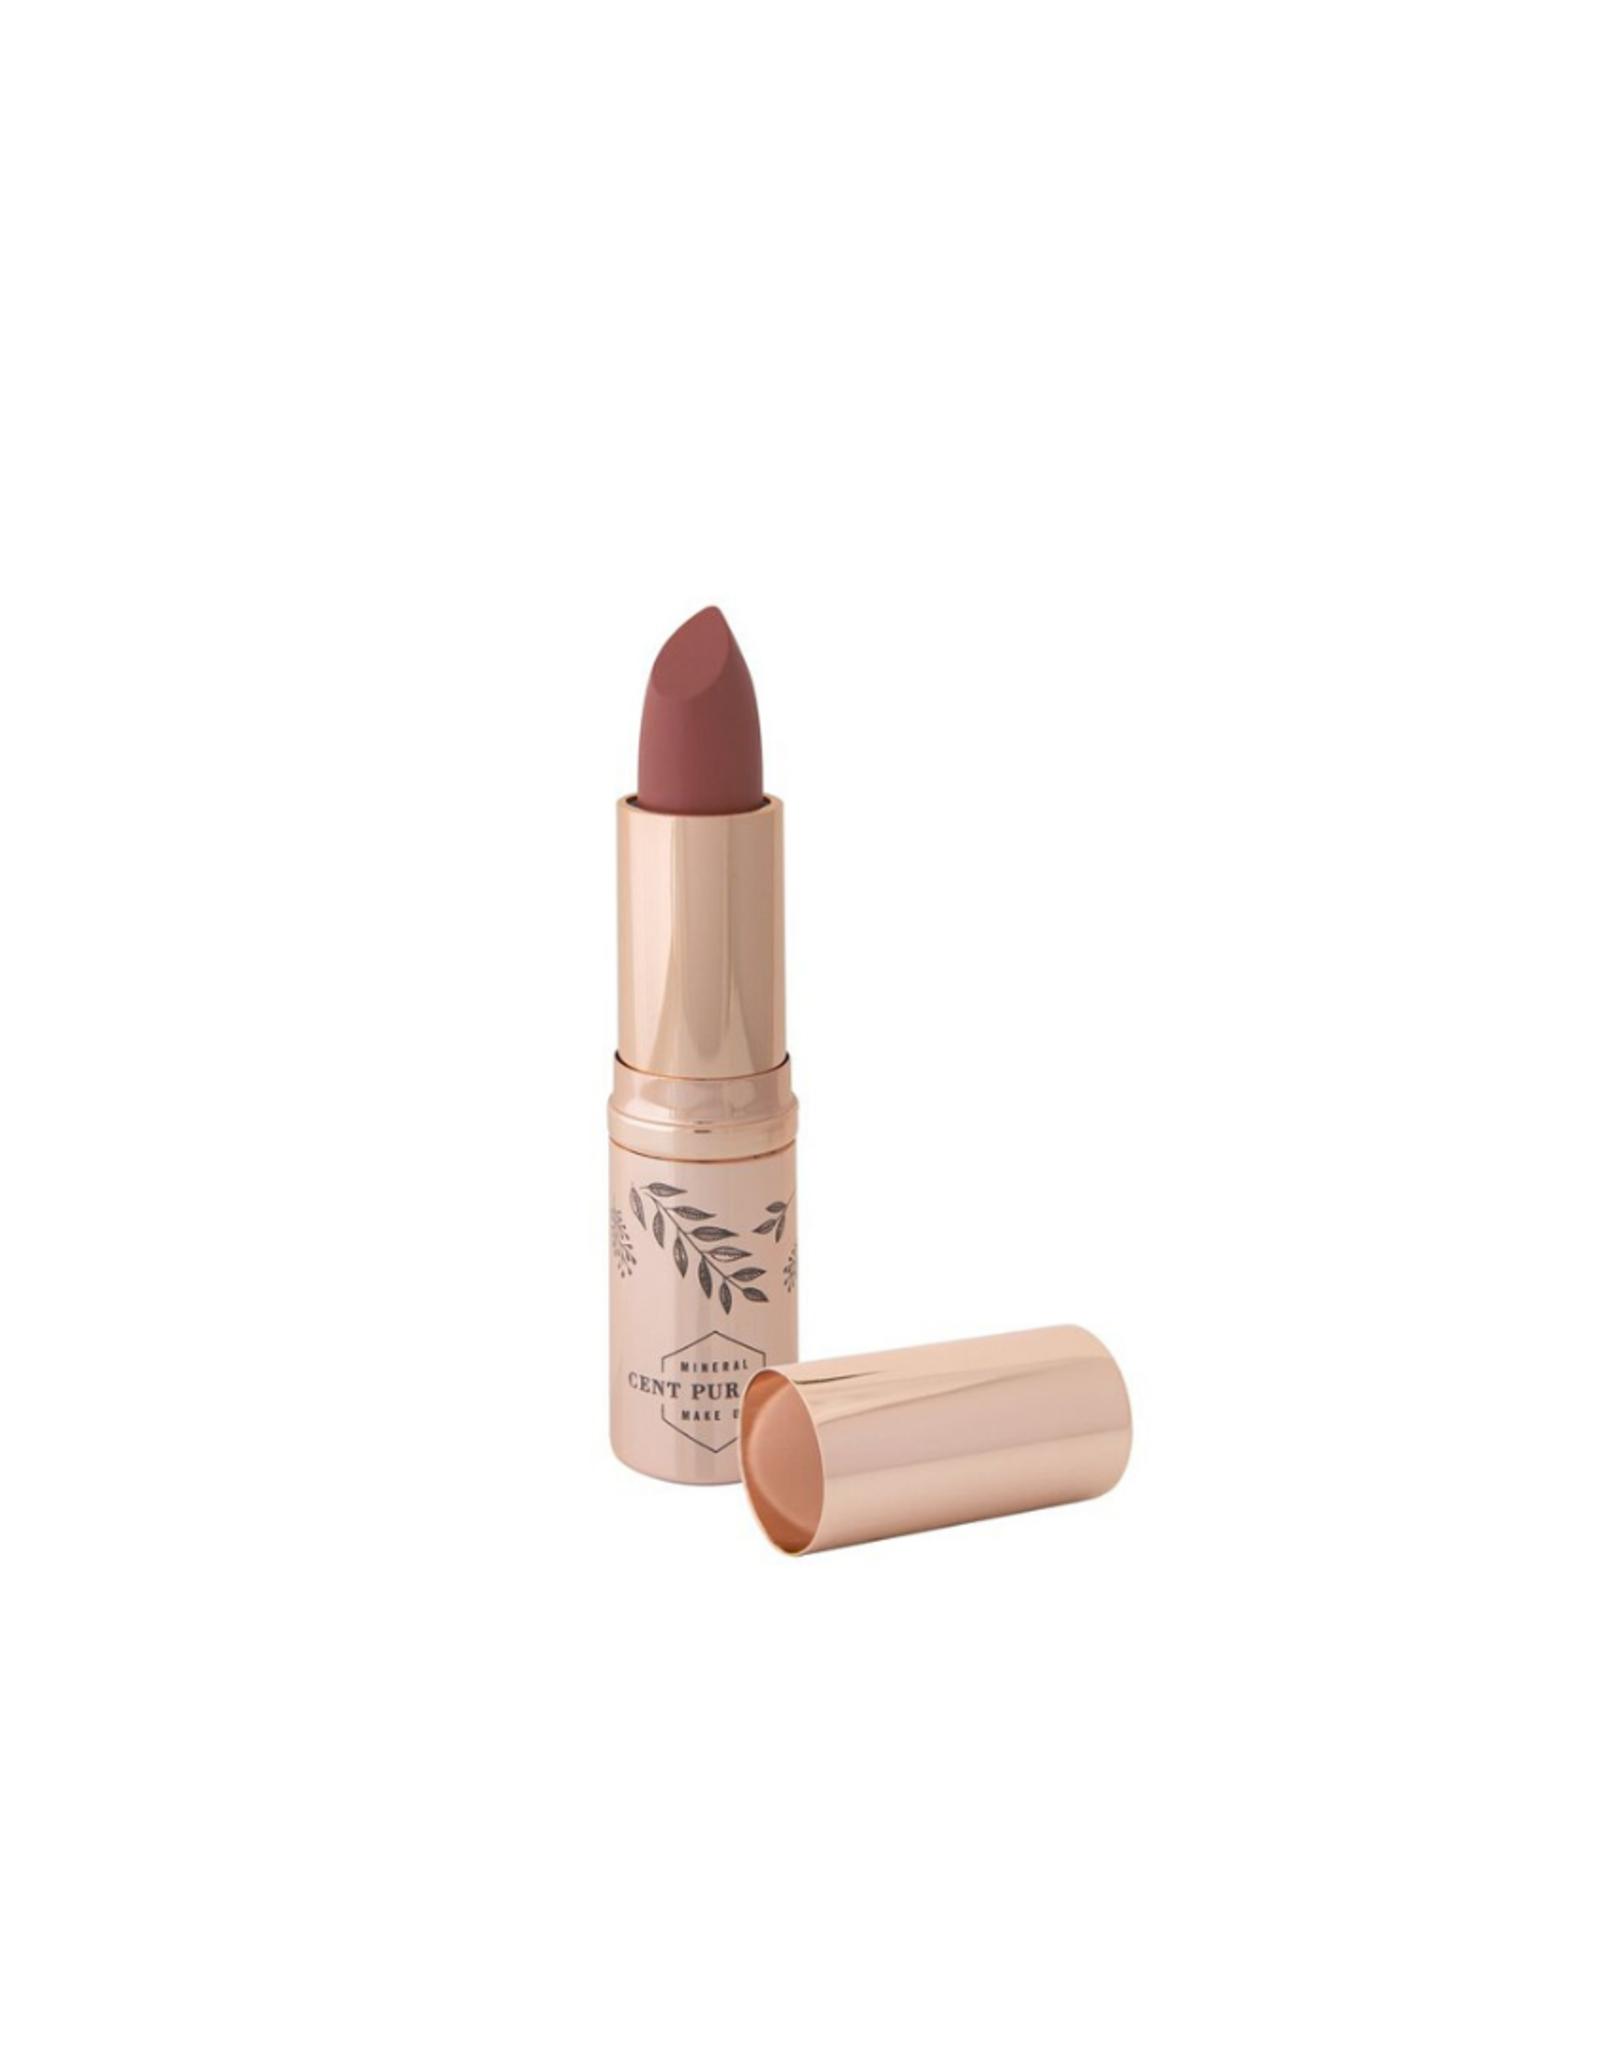 CentpurCent CentpurCent - Mineral Lipstick Creme Brulee